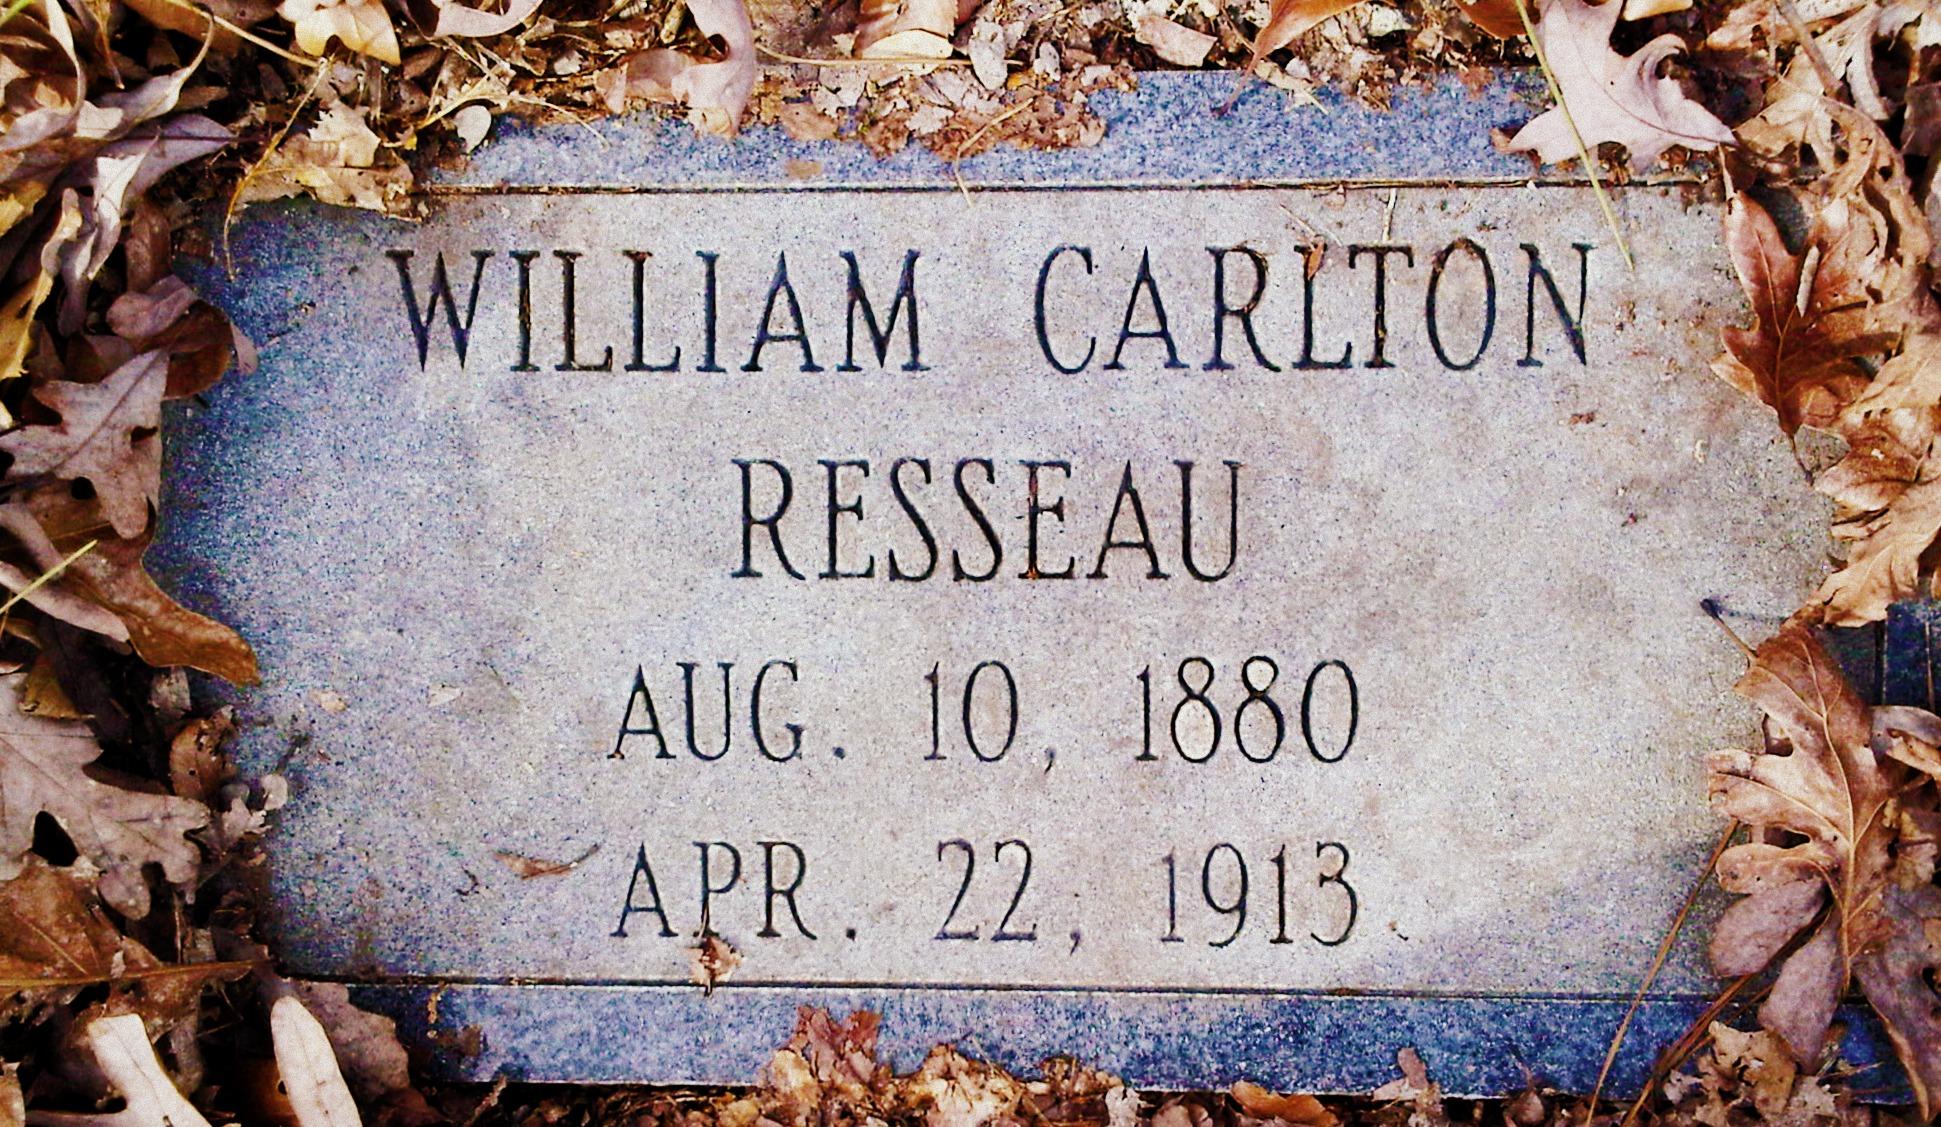 William Carlton Resseau